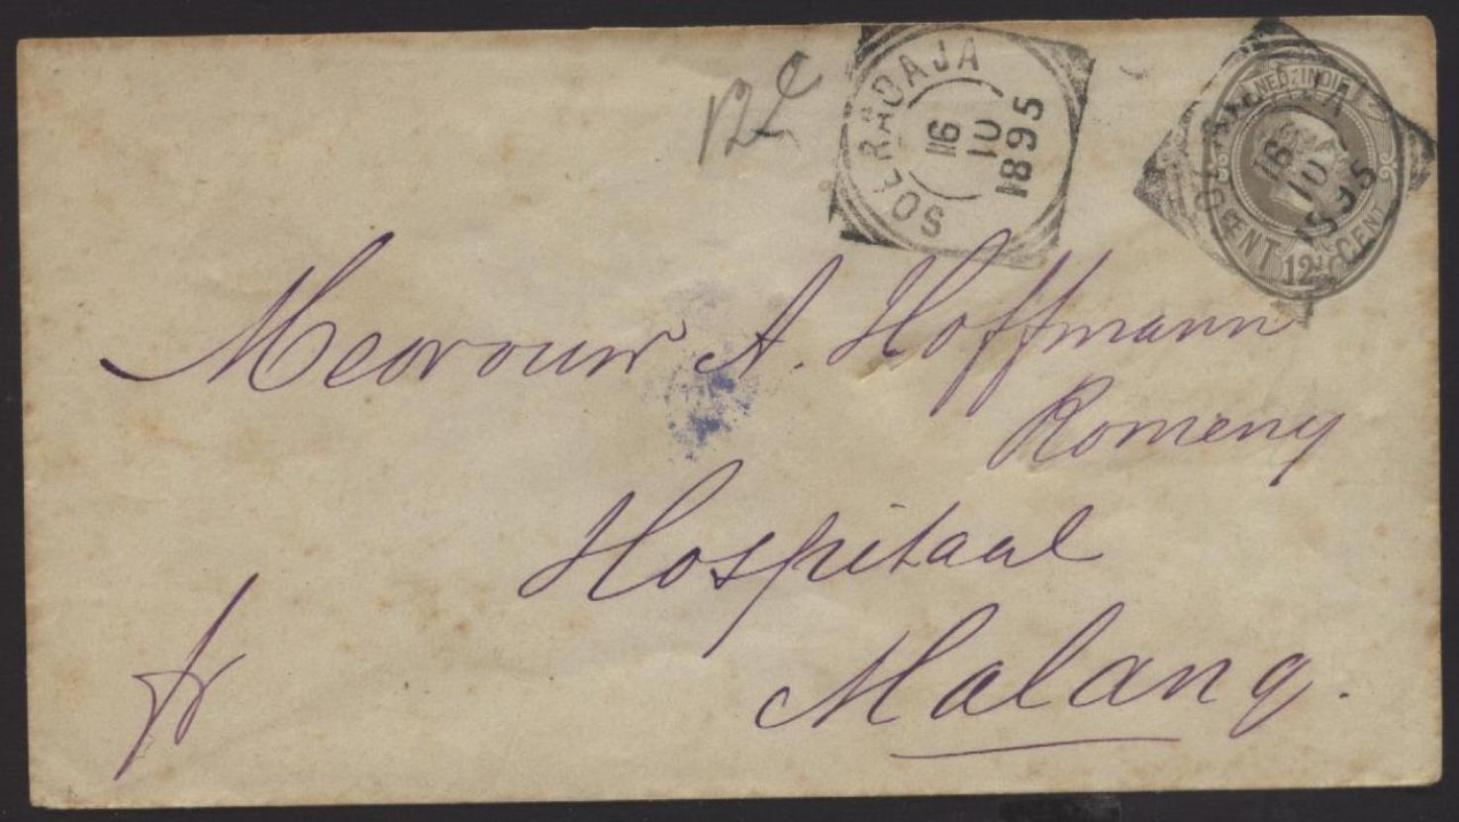 Koleksi Tempo Doeloe Sampul Surat Amplop Kuno Indonesia